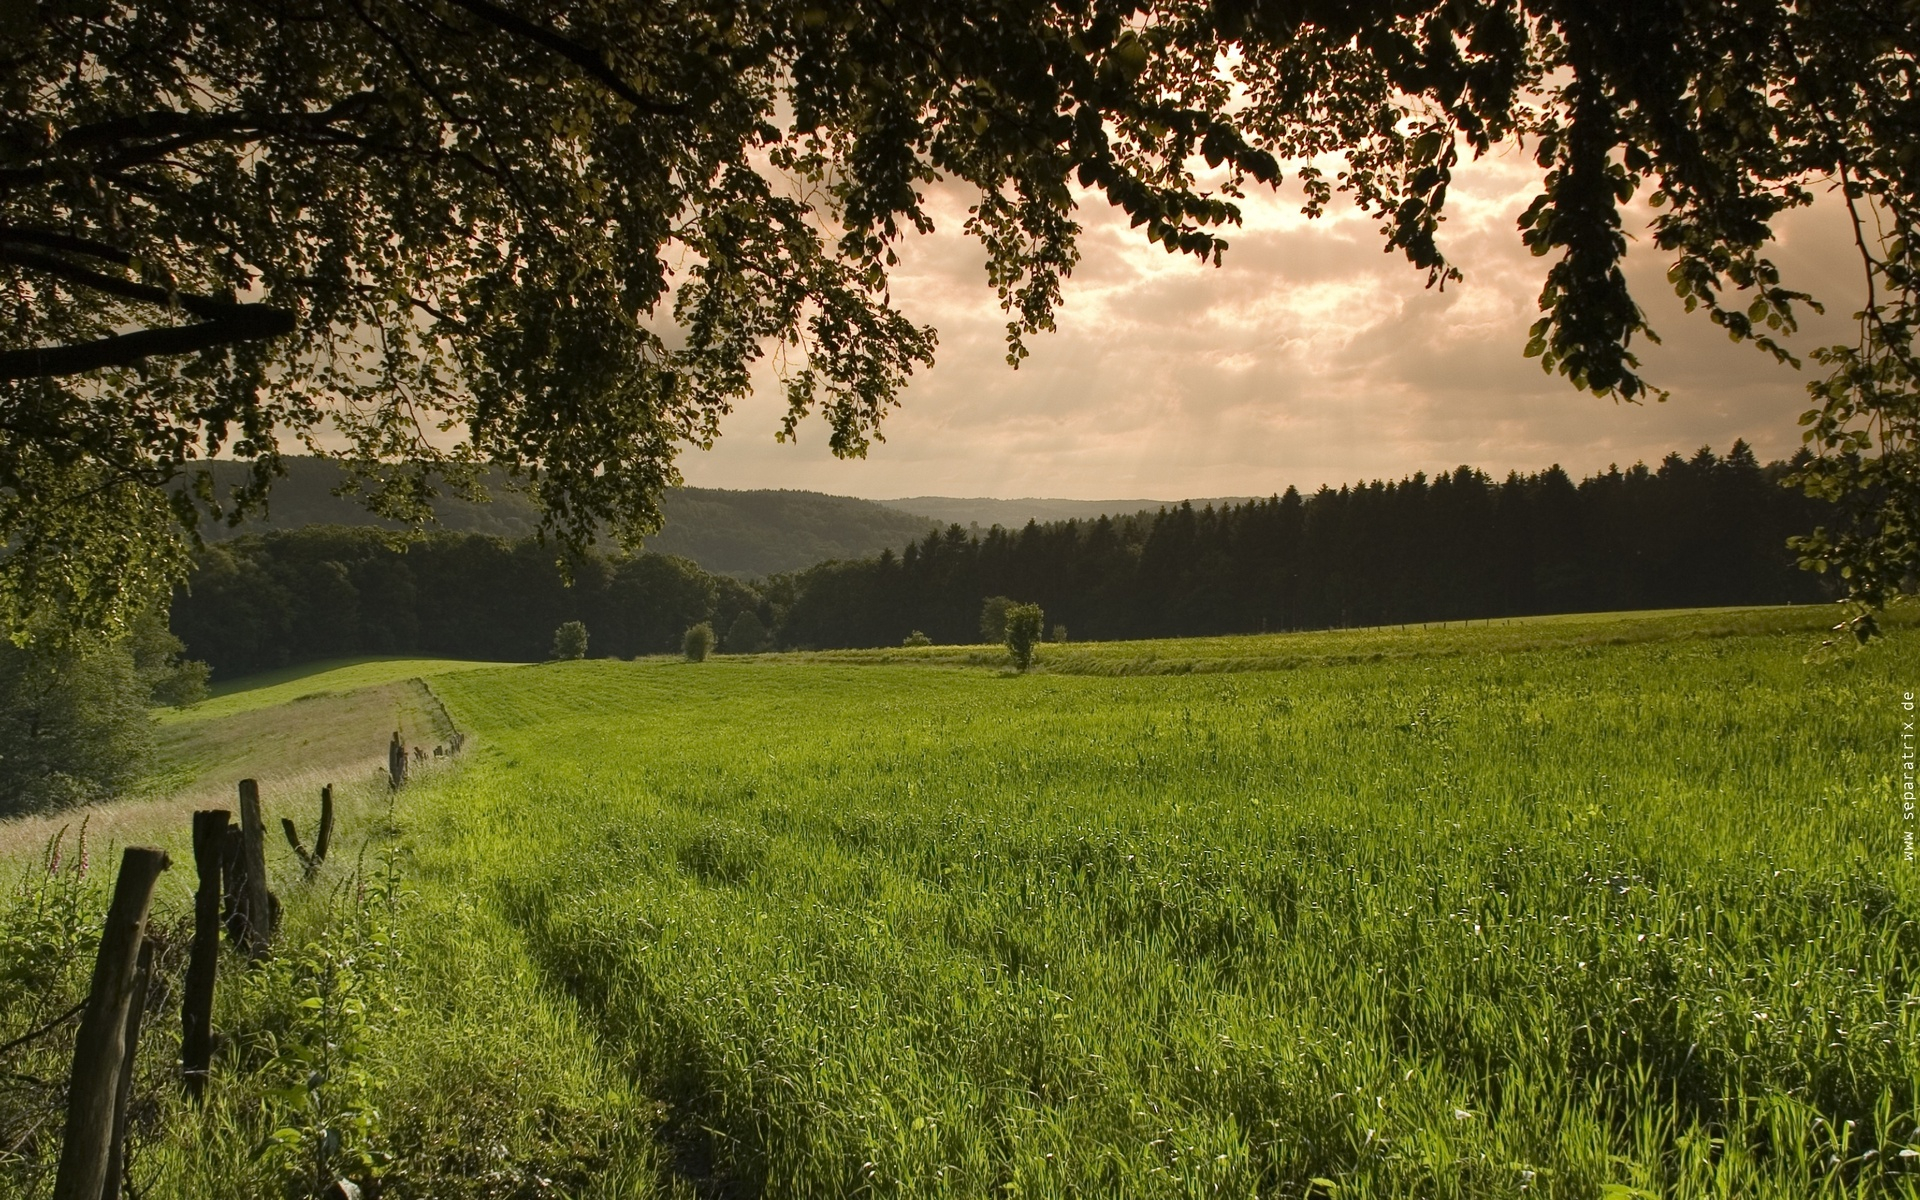 поле, трава, зеленая